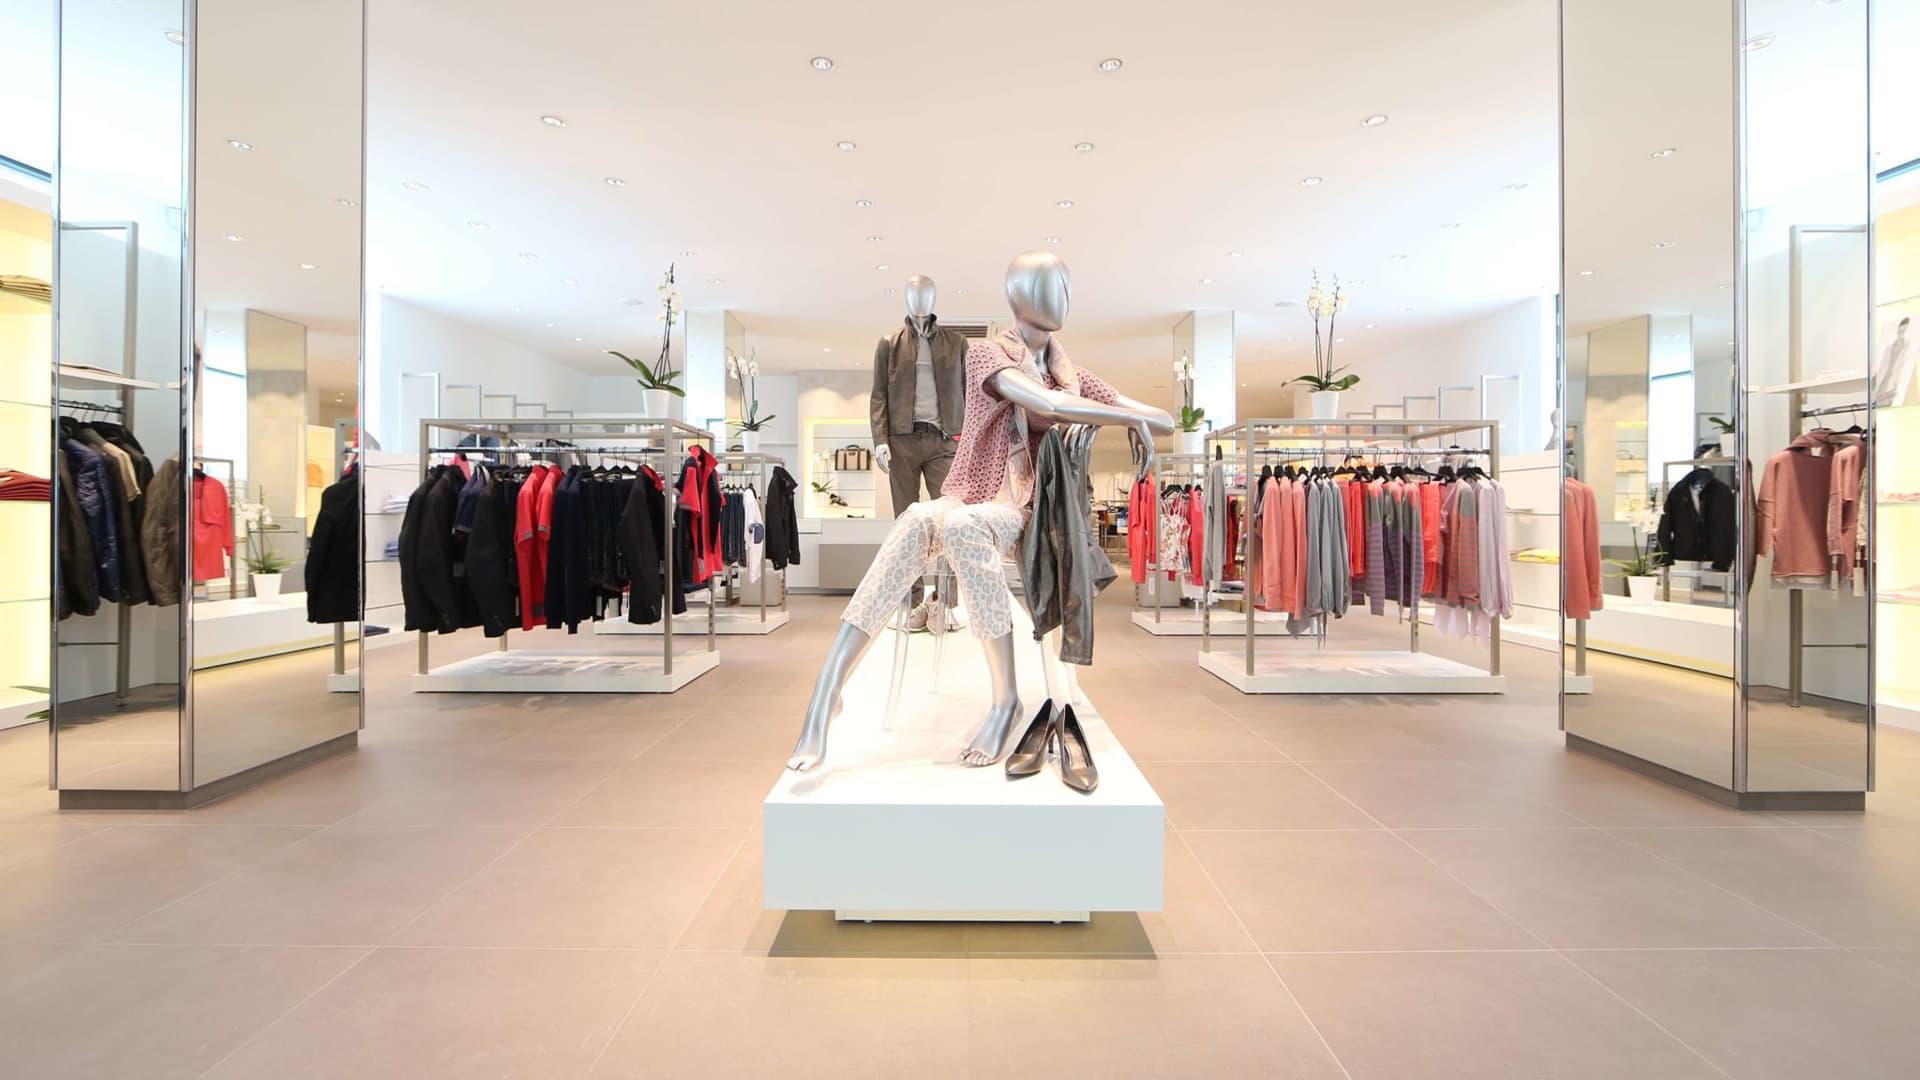 Ladenbau Bekleidungsgeschäft Schweiz